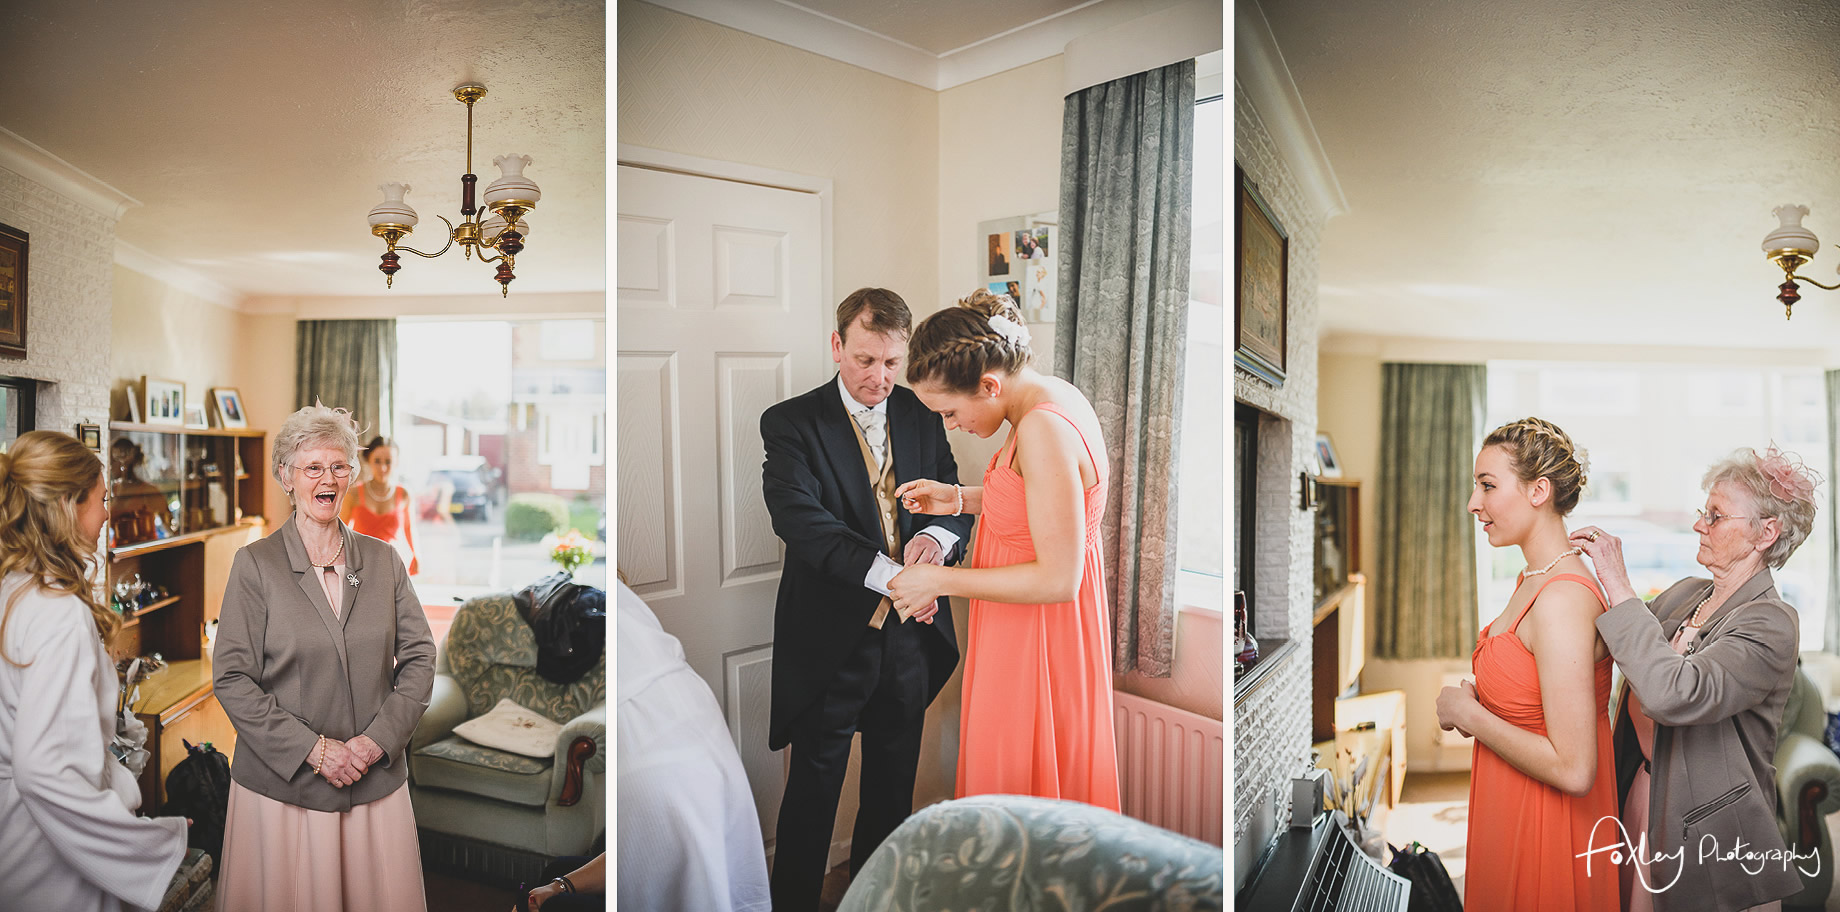 Gemma and Lewis' Wedding at Mitton Hall 029